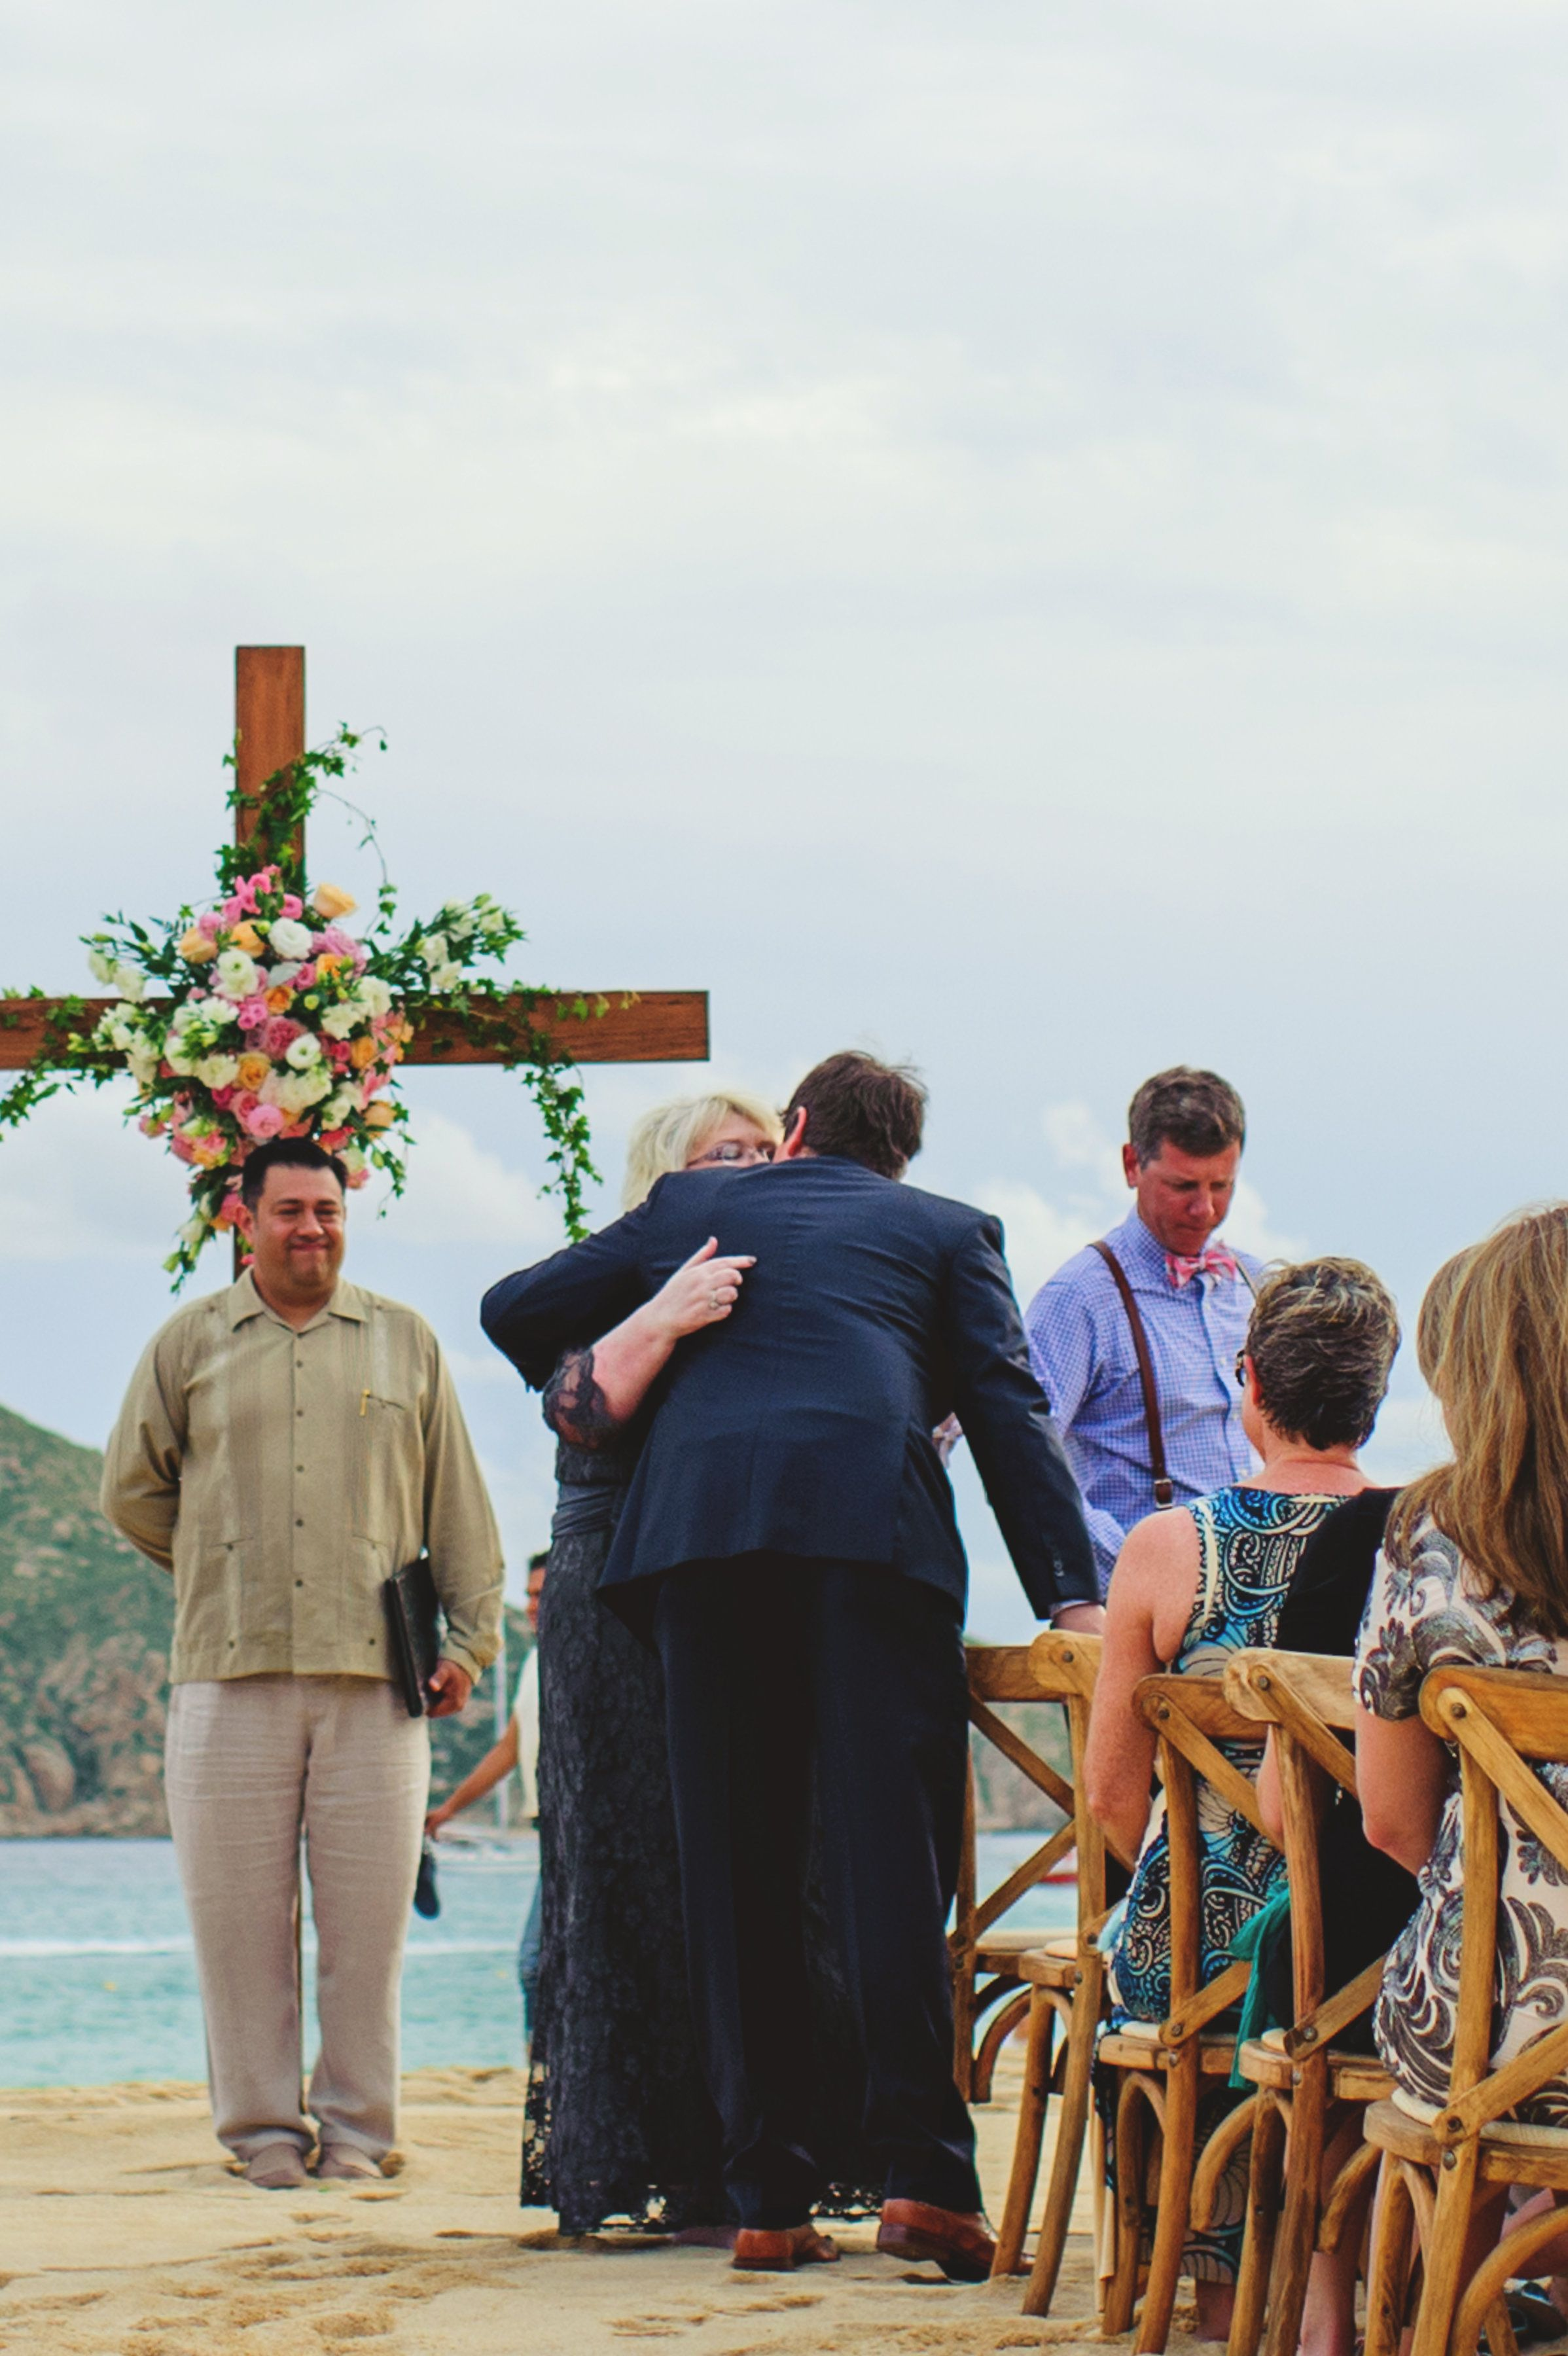 Beach Wedding Ceremony in Mexico